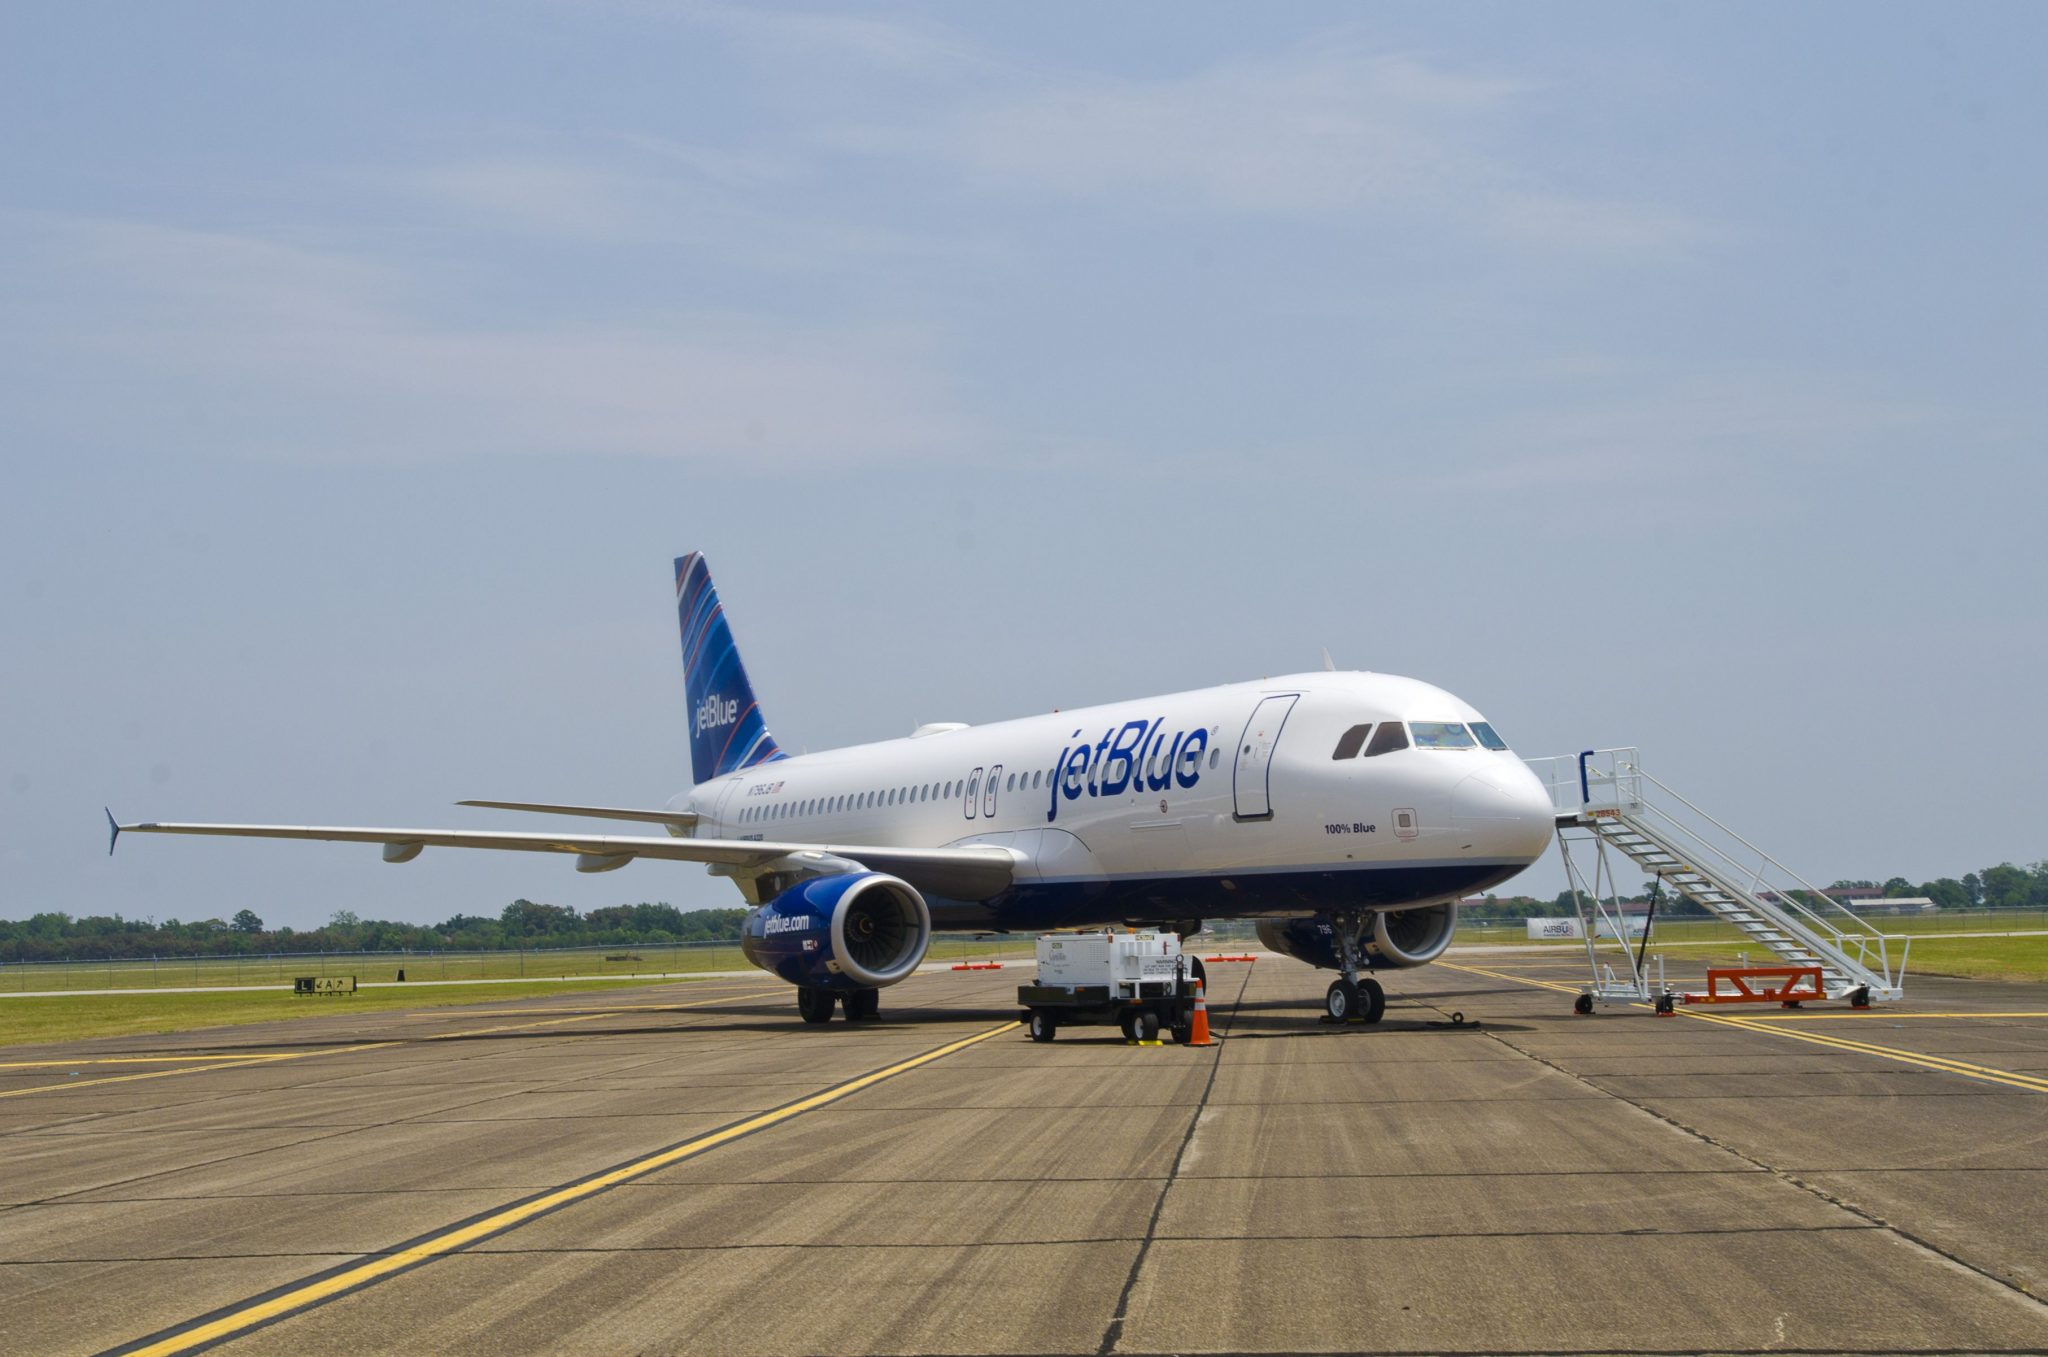 Costa Rica anuncia nueva ruta de aerolínea JetBlue a San José